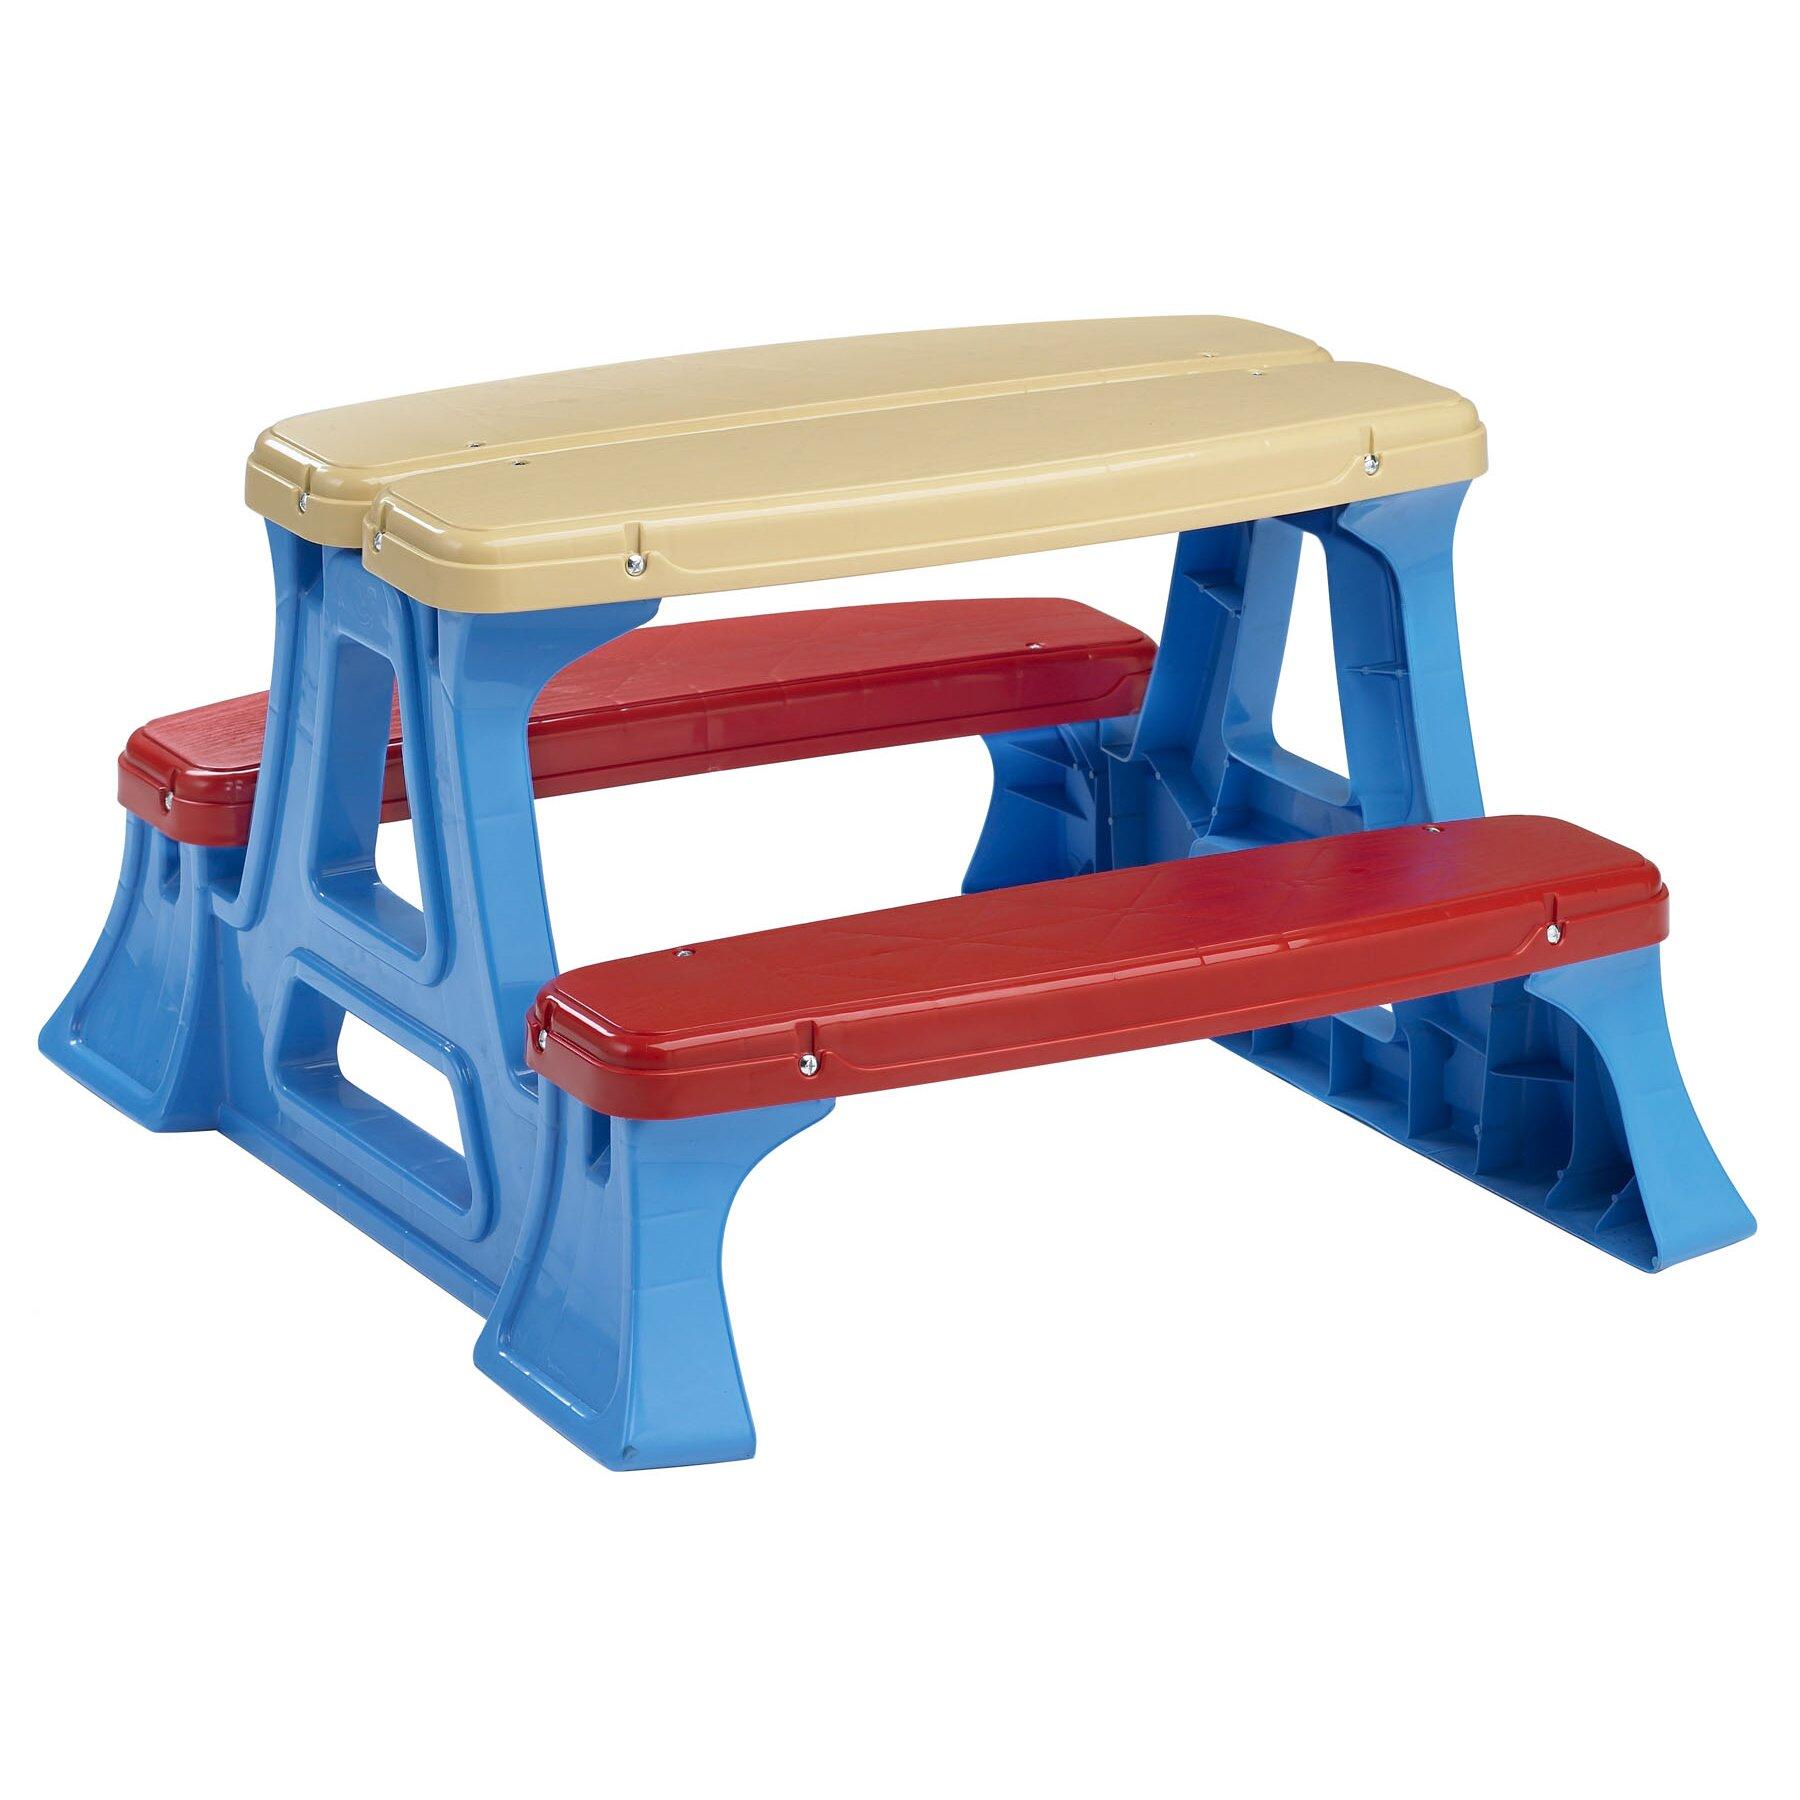 American Plastic Toys Kids Picnic Table & Reviews | Wayfair